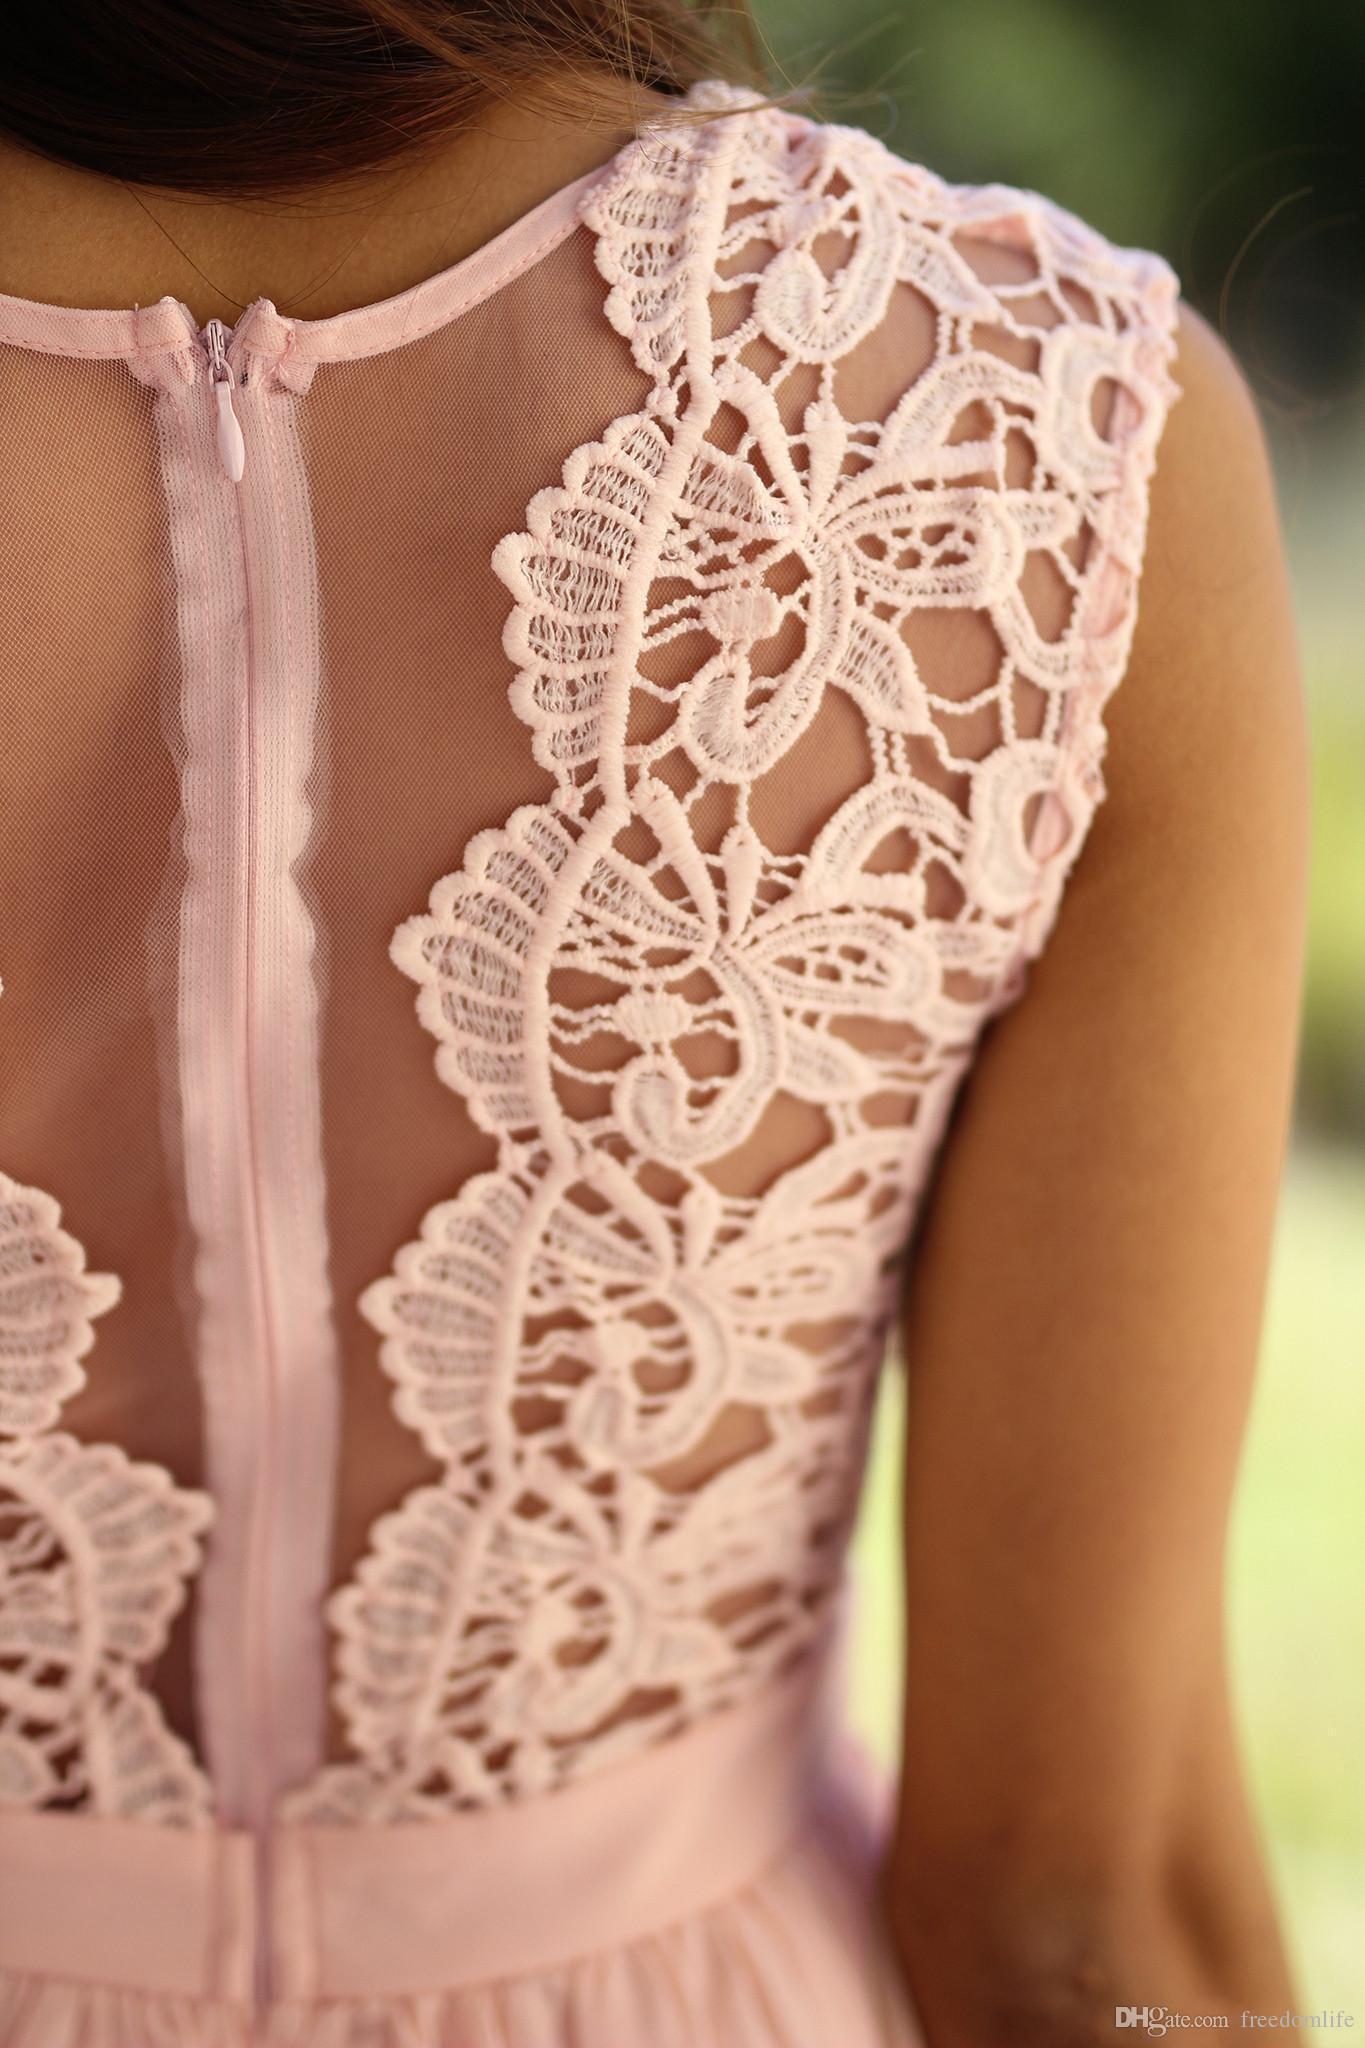 Elegant Lace Coral Bridesmaid Dresses Jewel Sleeveless Wedding Guest Dress Zipper Chiffon Cheap bridesmaids dress Formal Maid of Honor Gown